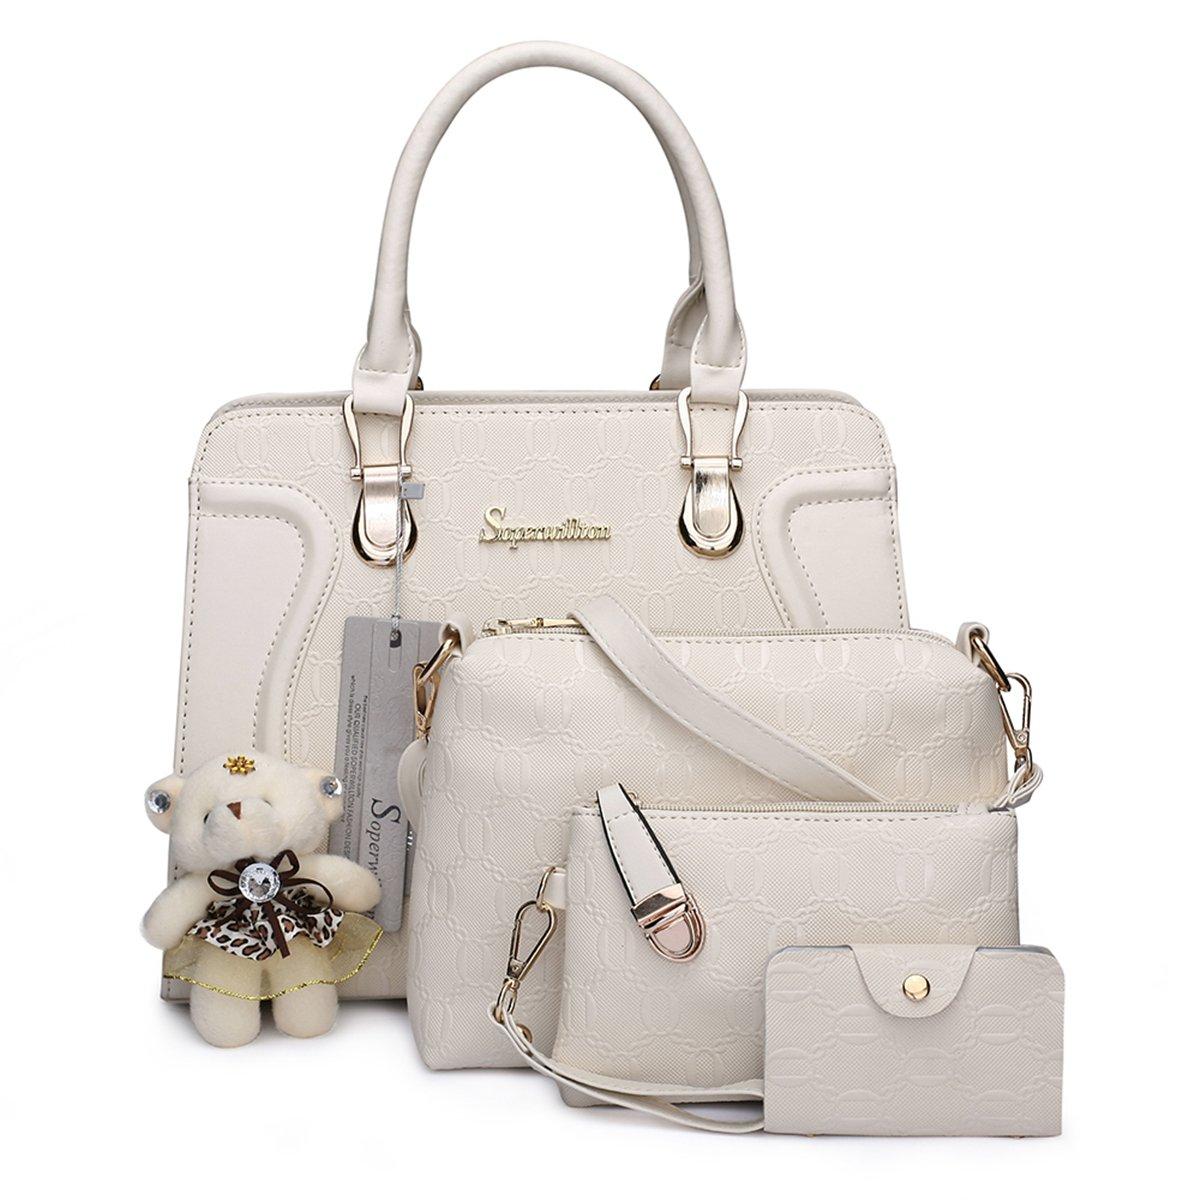 7975735c19 Amazon.com  Soperwillton Handbag for Women Tote Bag Shoulder Bags Satchel  4pcs Purse Set  Shoes